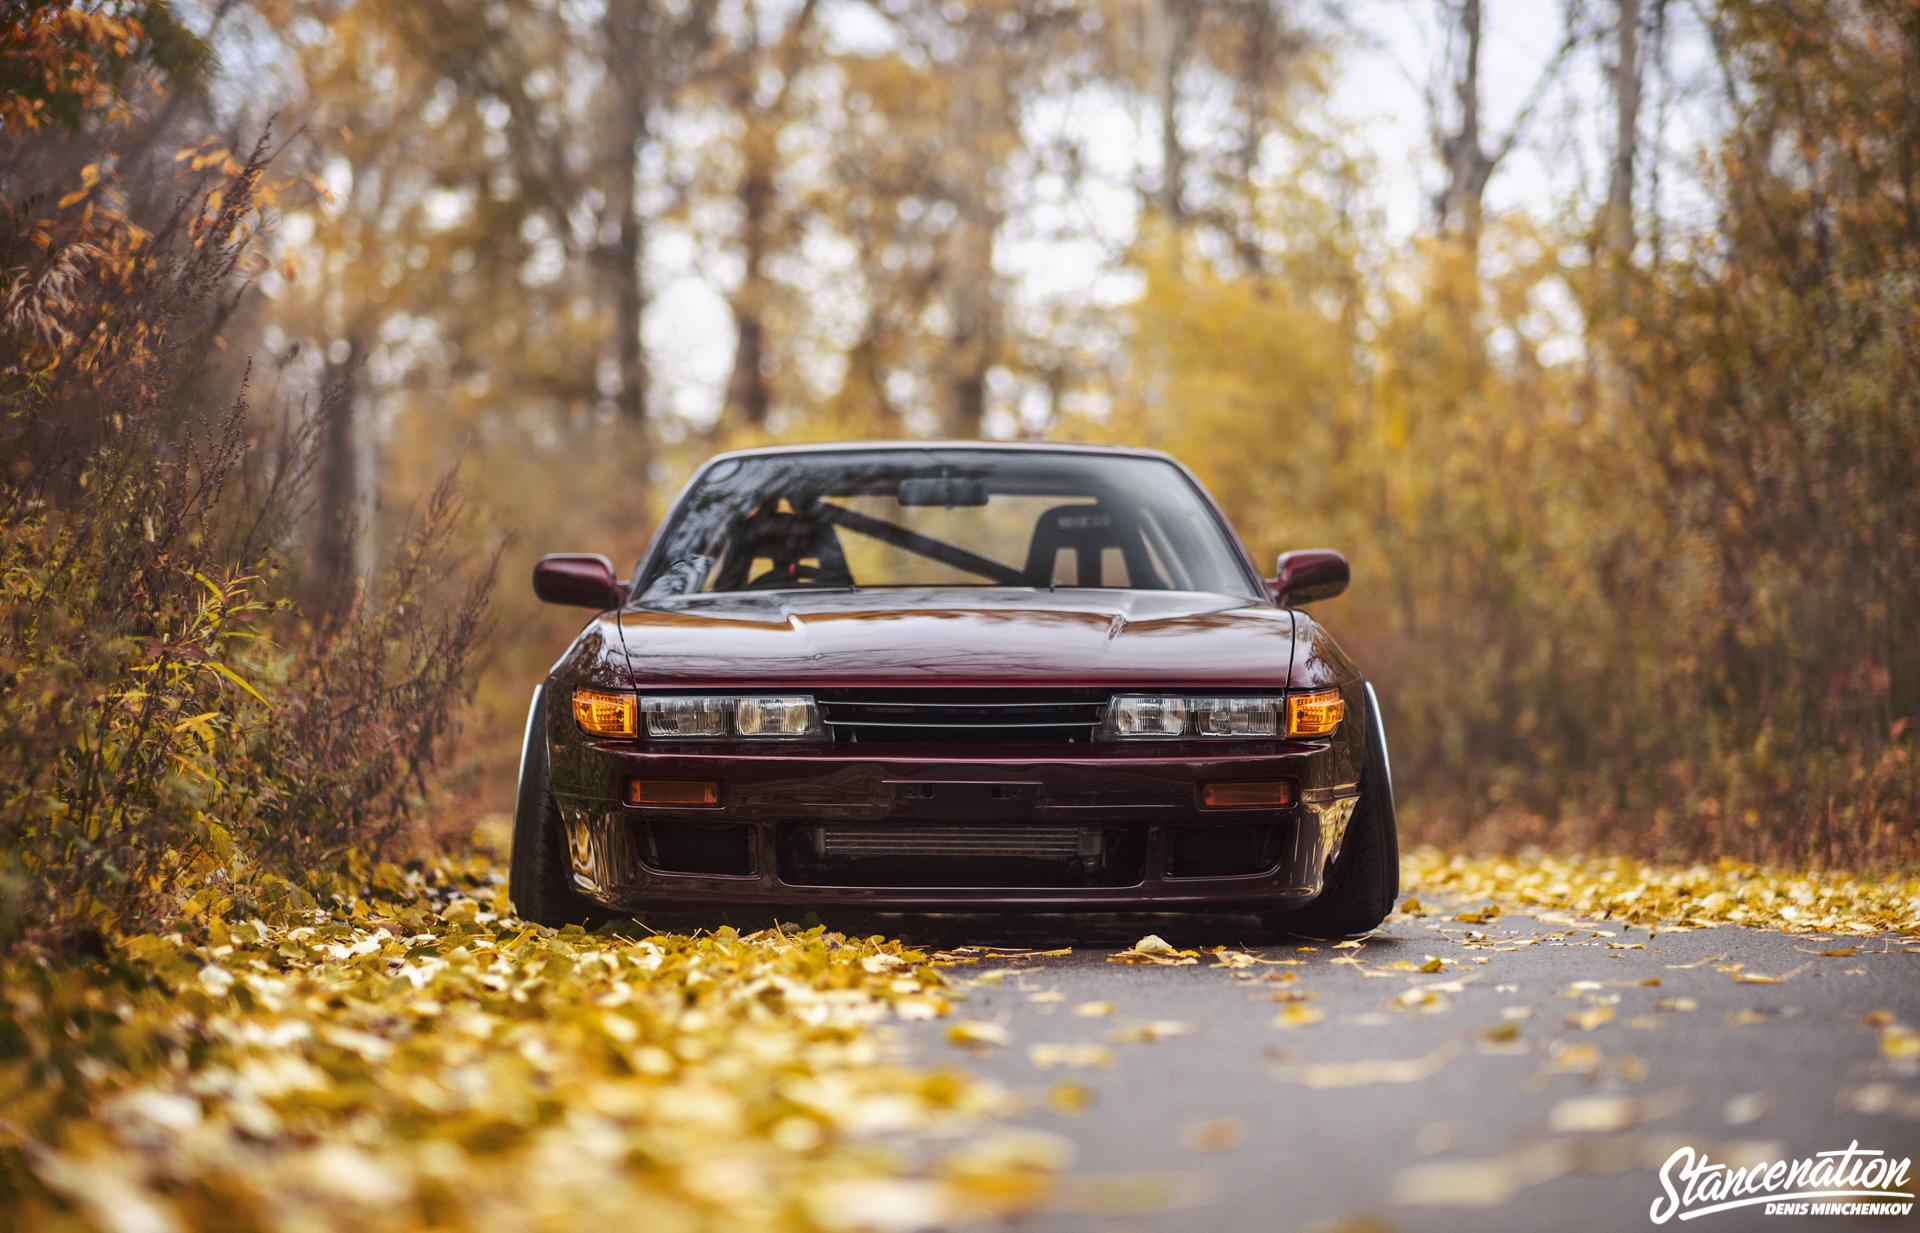 Rotary Powered // Artem Valitov's Nissan Silvia S13